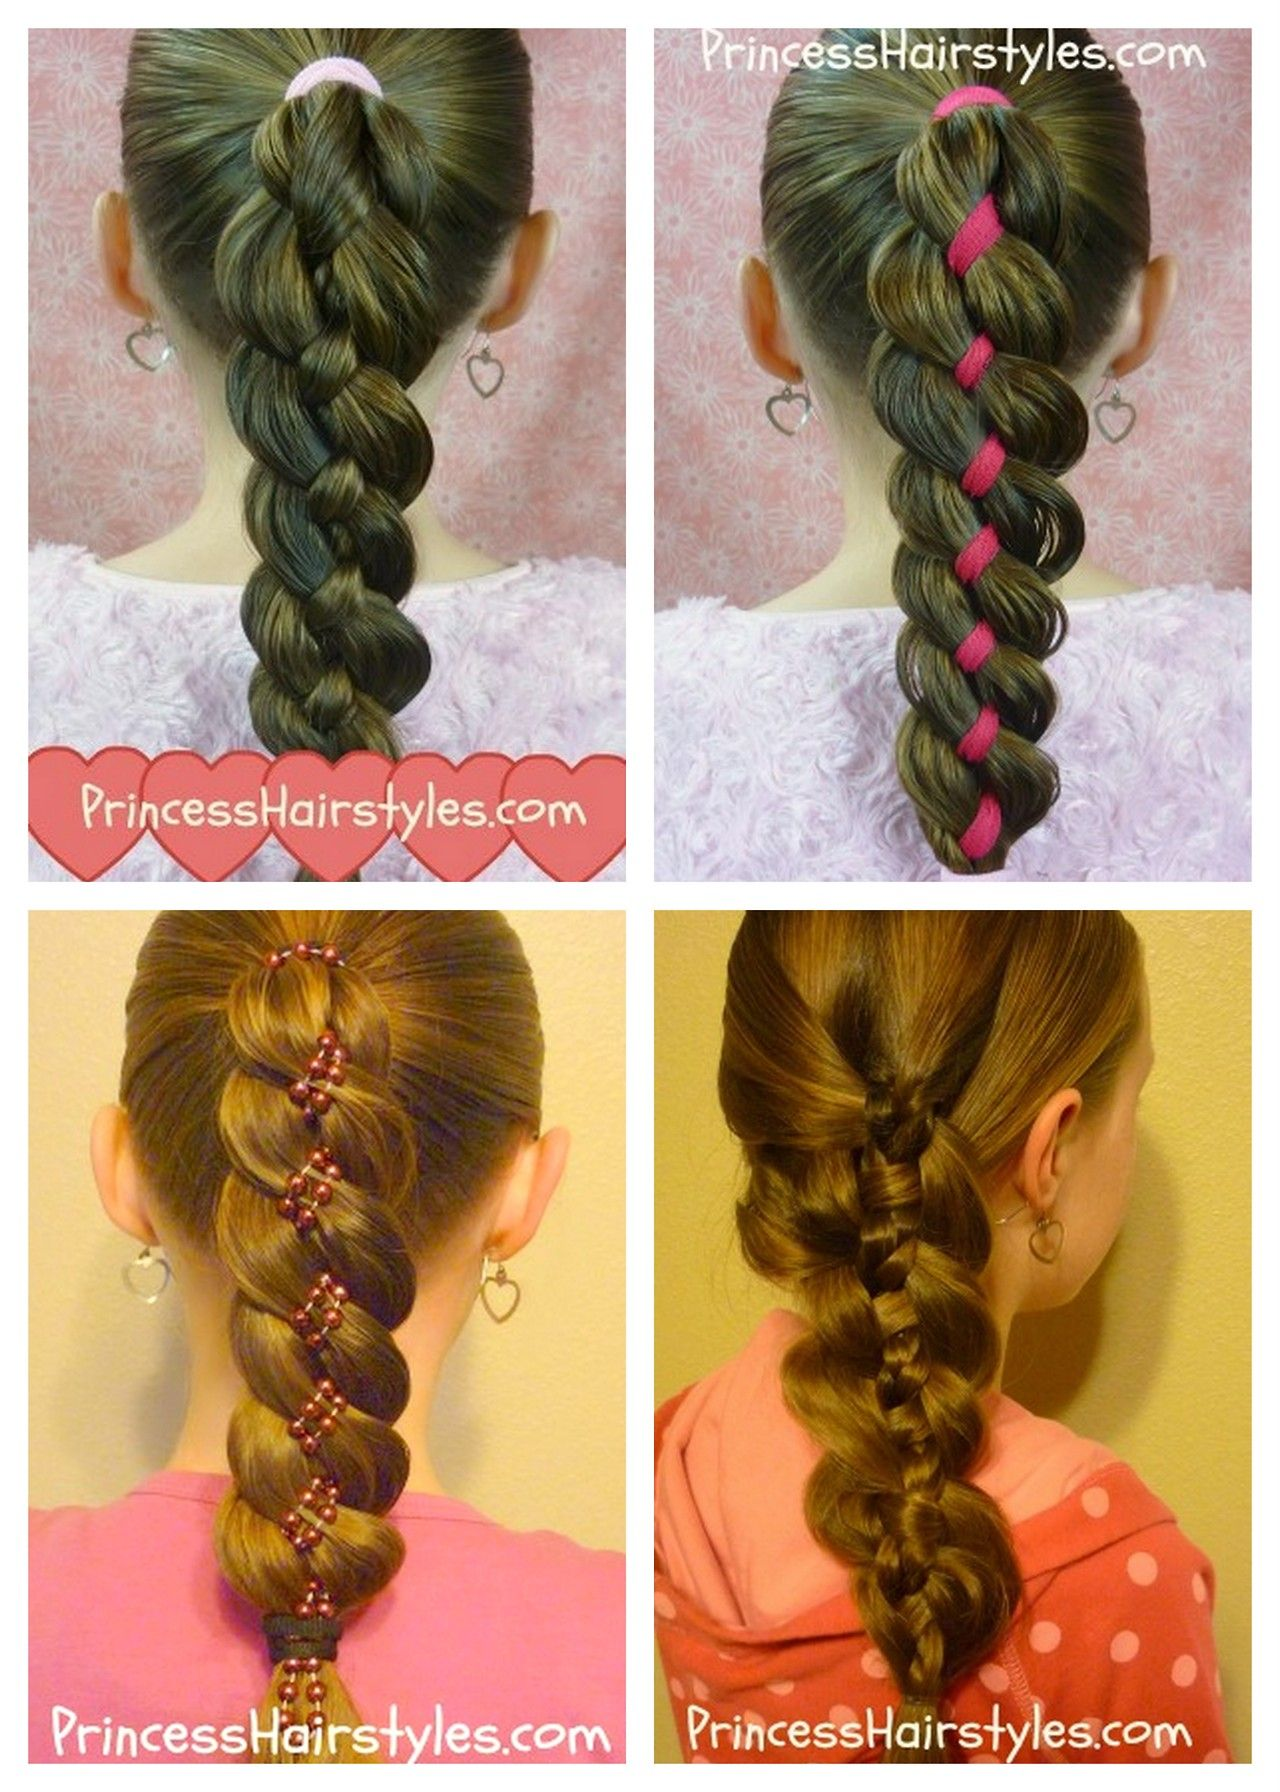 diy 4 strand hair braid video tutorial from princess